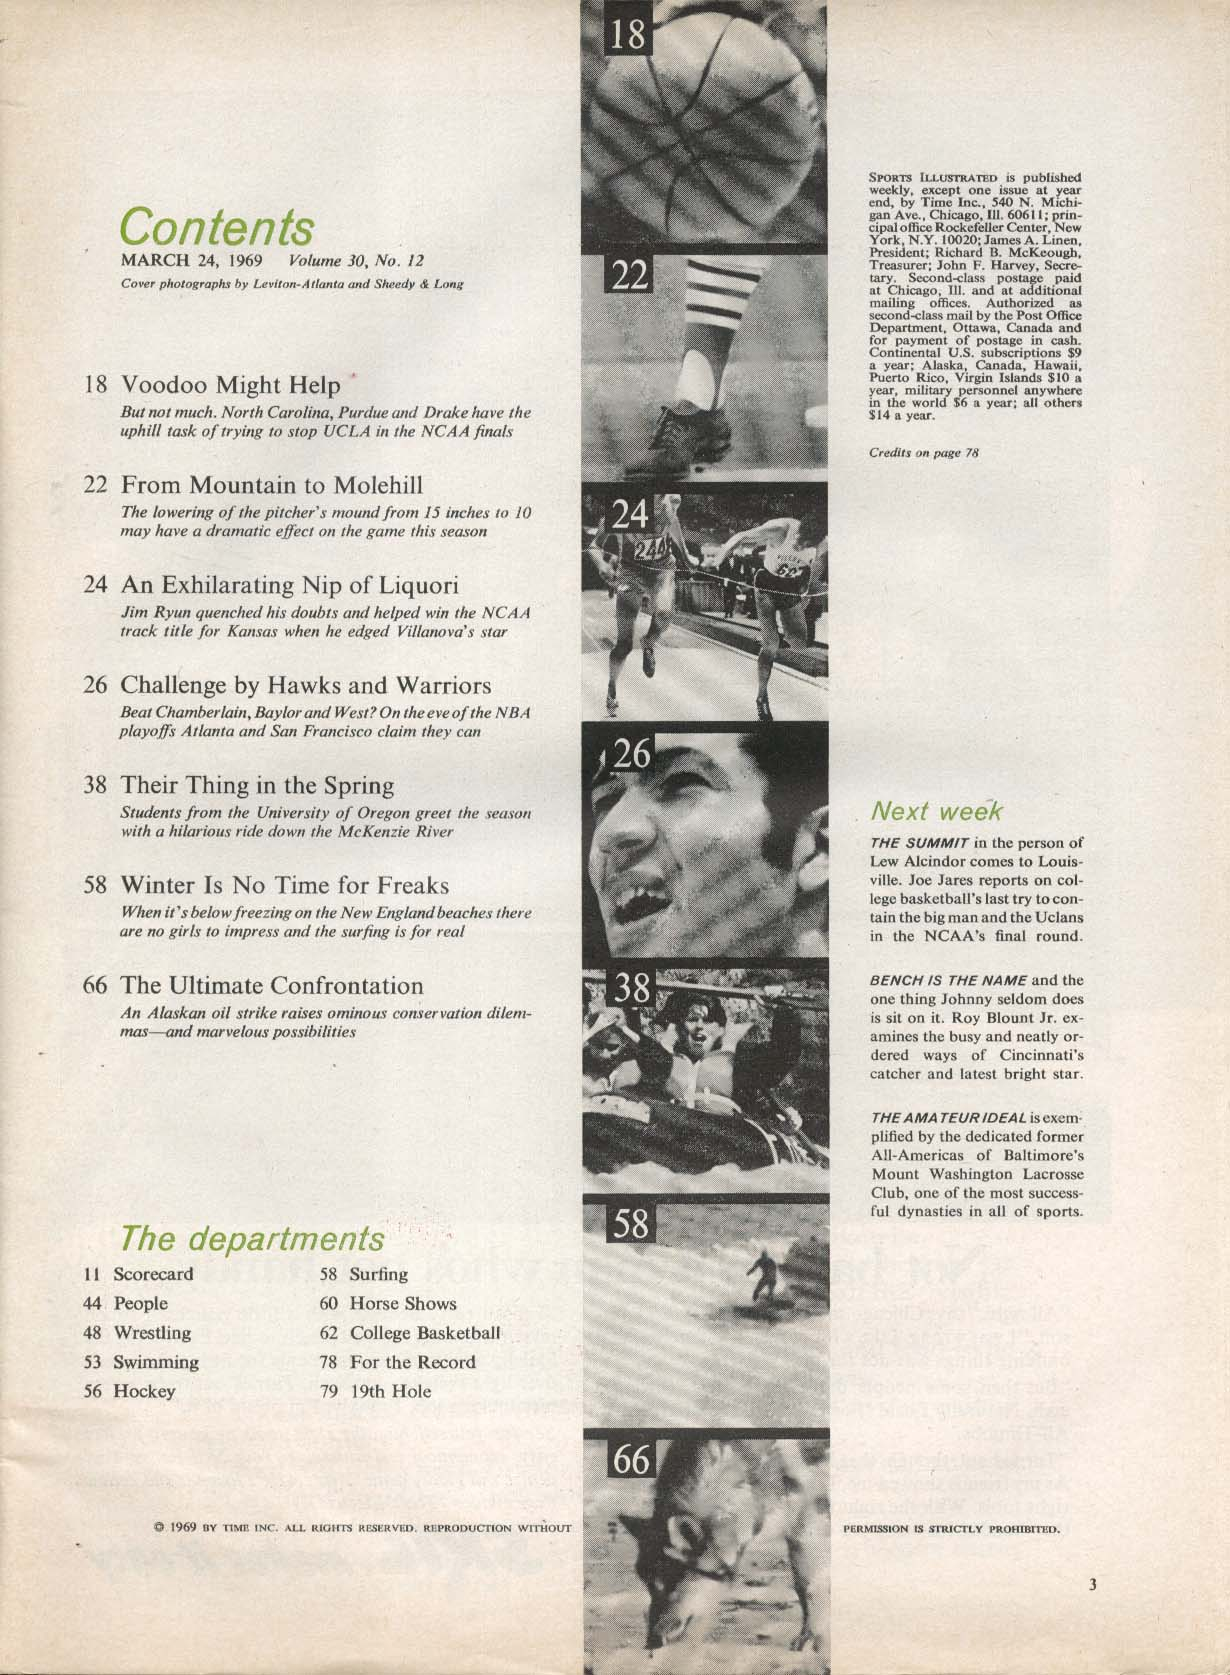 SPORTS ILLUSTRATED Richie Guerin Jeff Mullins Jim Ryan 3/24 1969